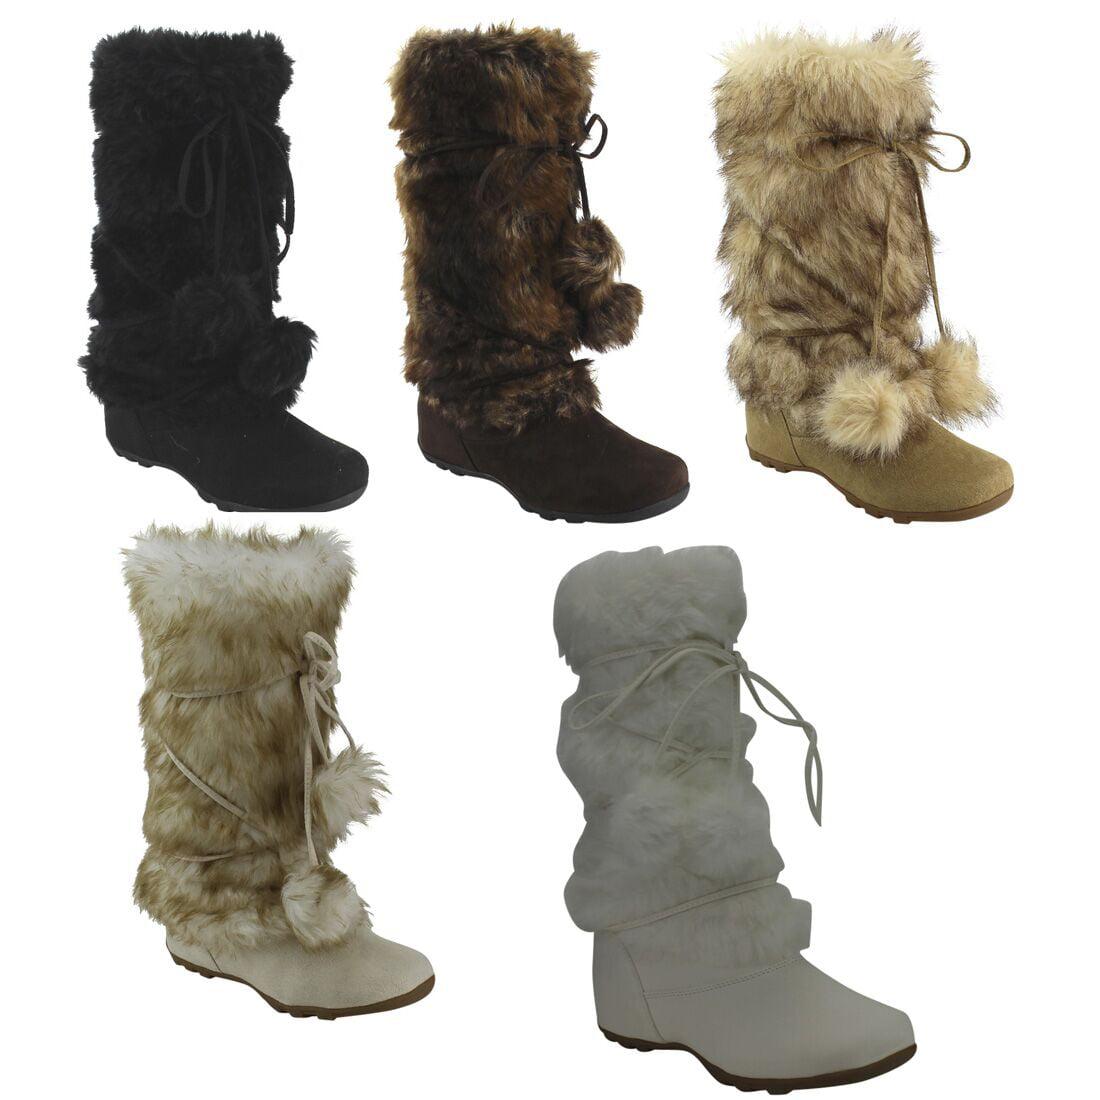 Mid-Calf Pom-Poms Flat Boots - Walmart